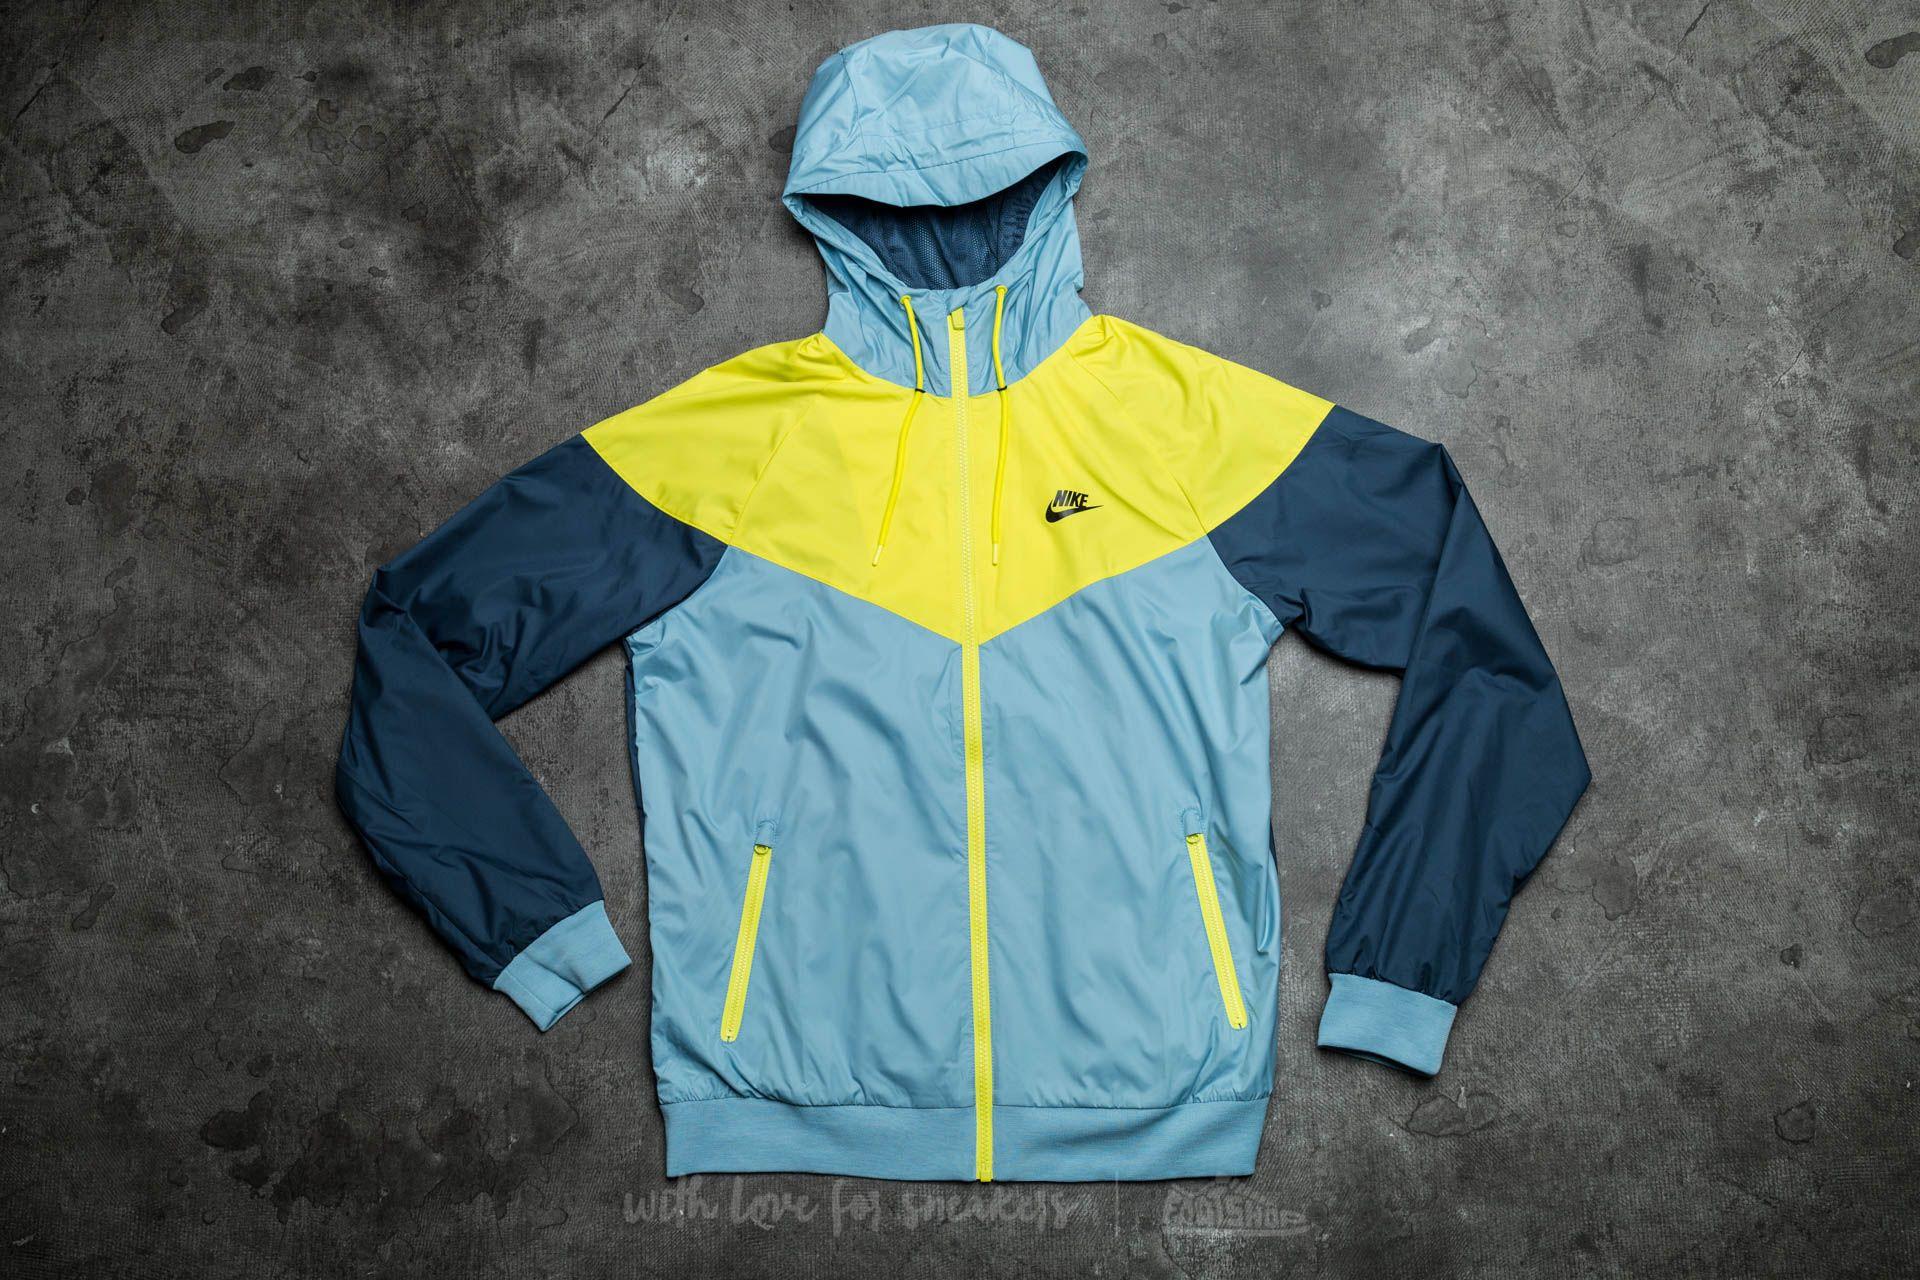 de7a820e43 Nike Sportswear Windrunner Mica Blue  Electrolime  Squadron Blue  Black